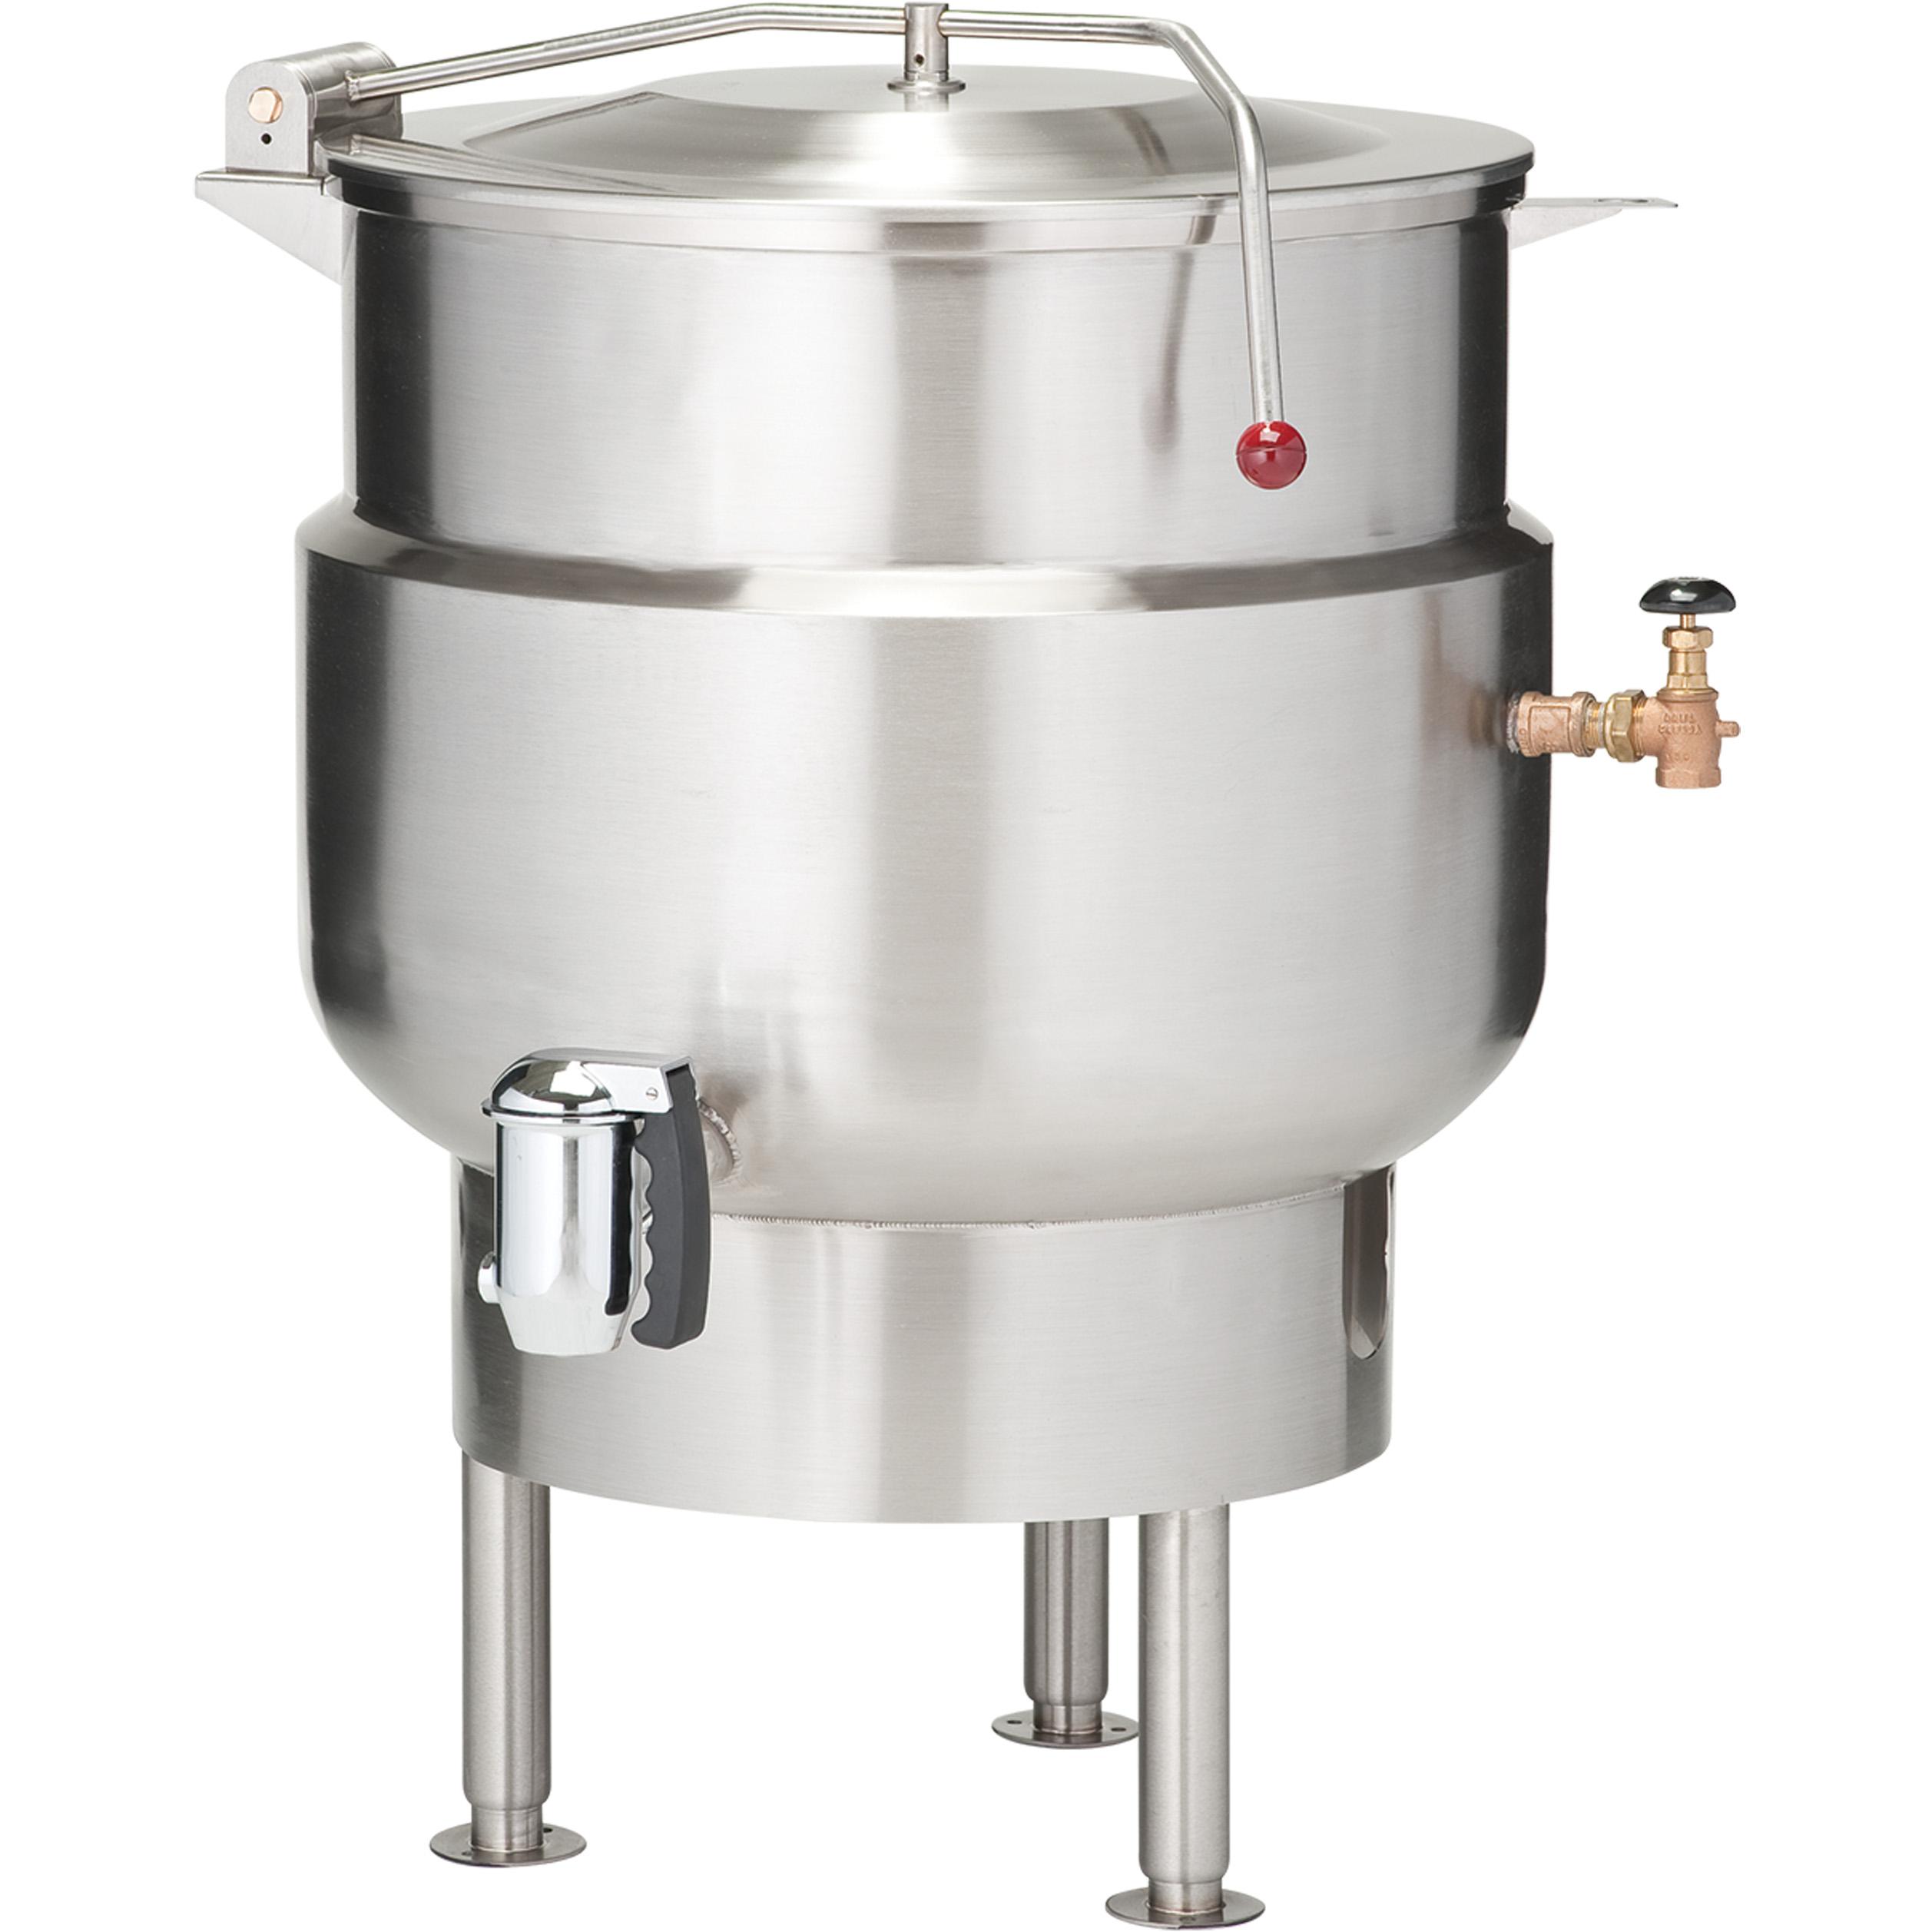 Vulcan K60DL kettle, direct steam, stationary